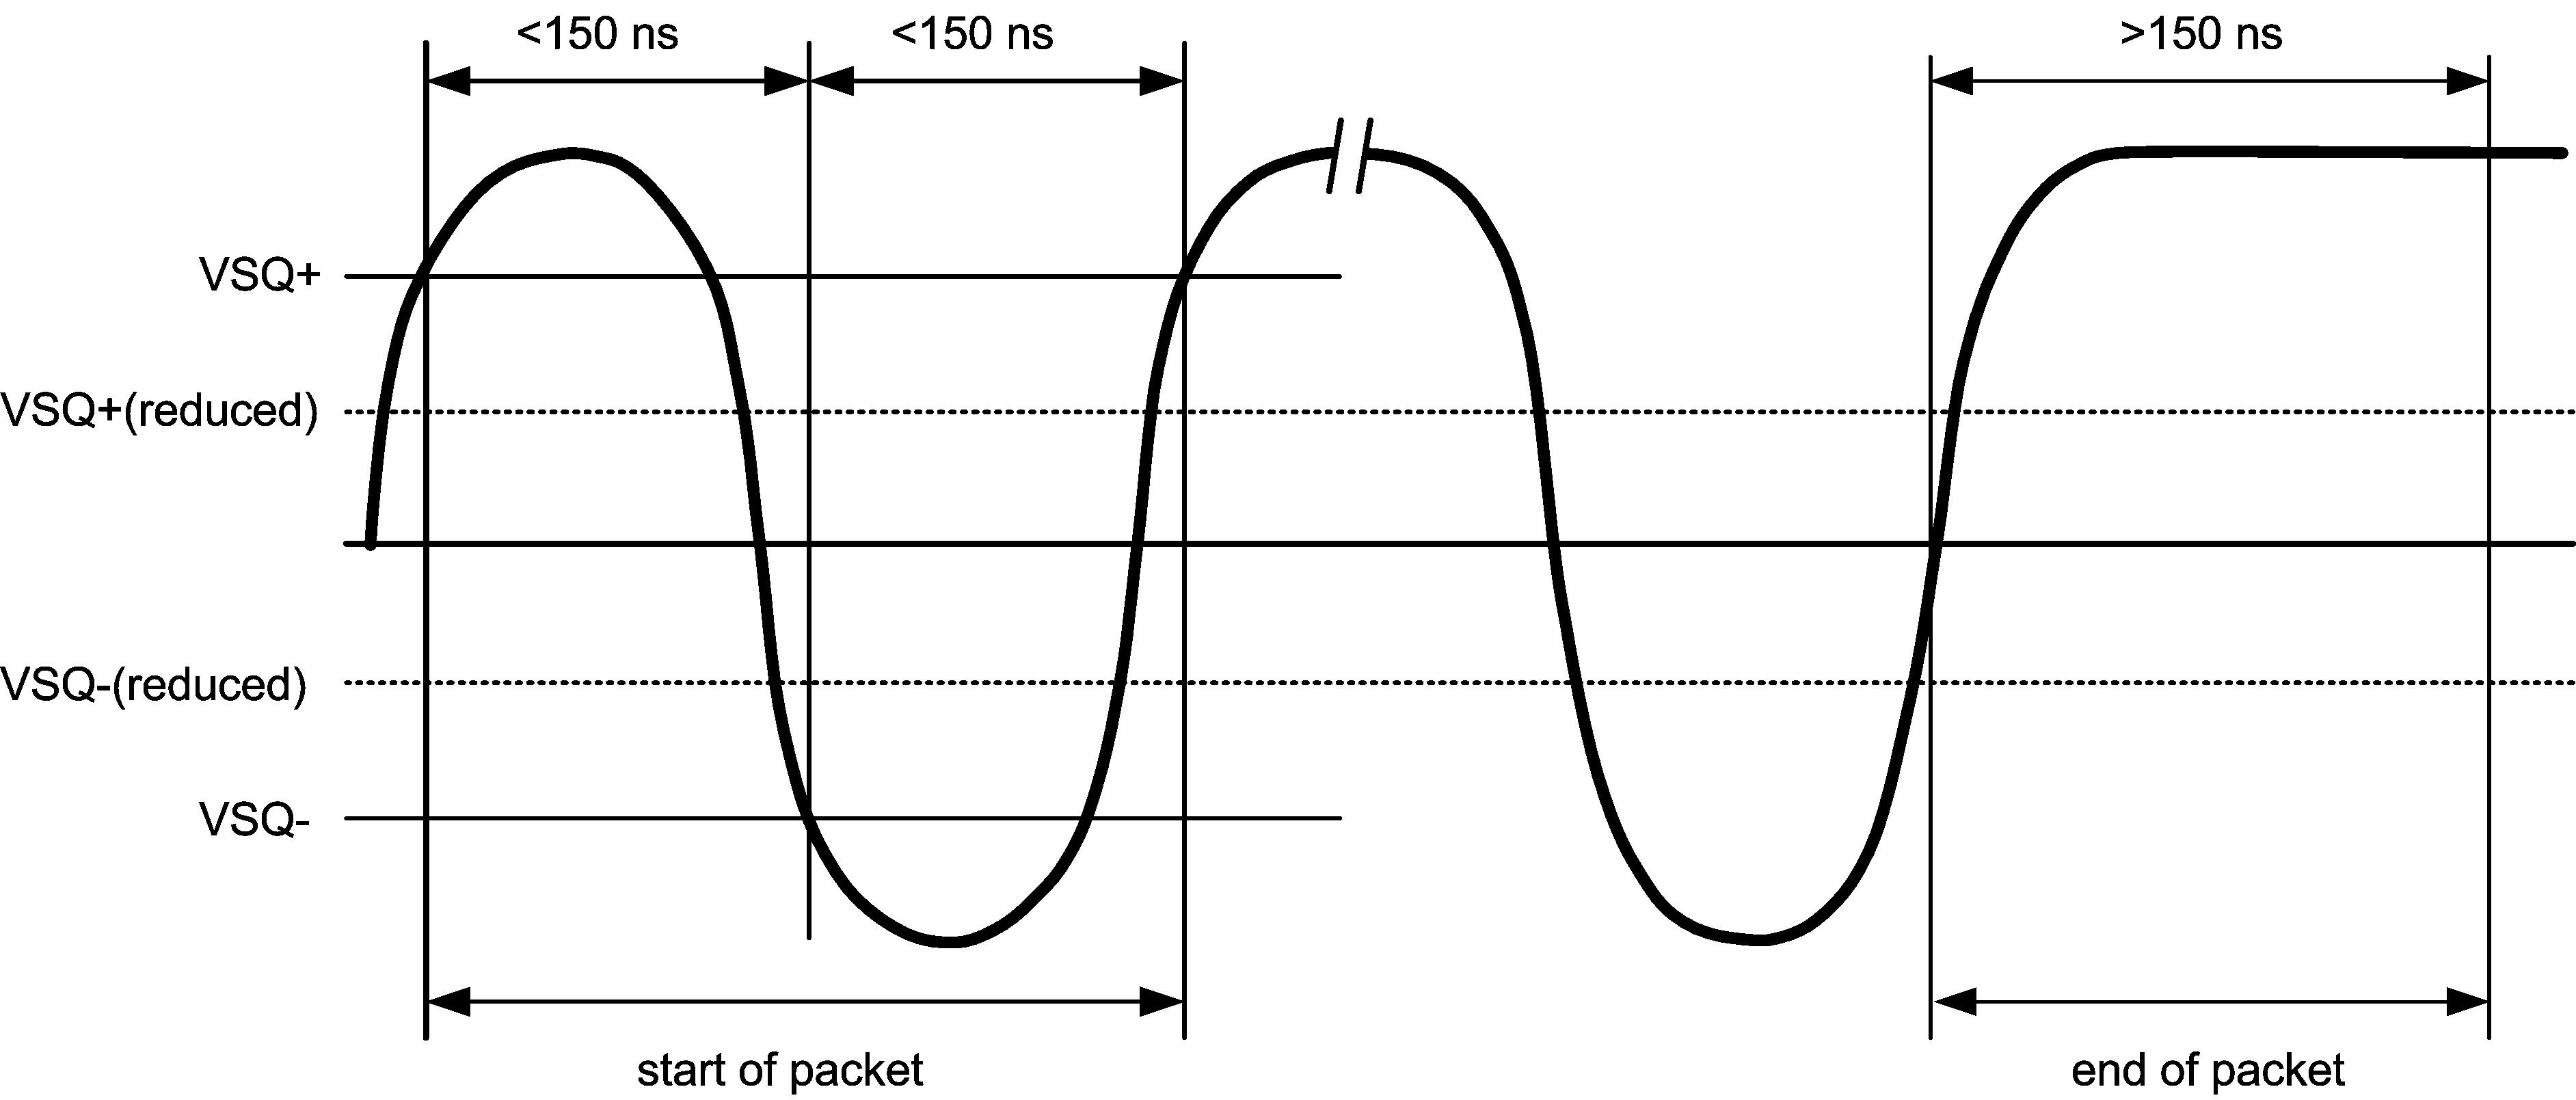 Dp83848q Q1 8 3 Encoder Logic Diagram 55133 Collision Detection And Sqe